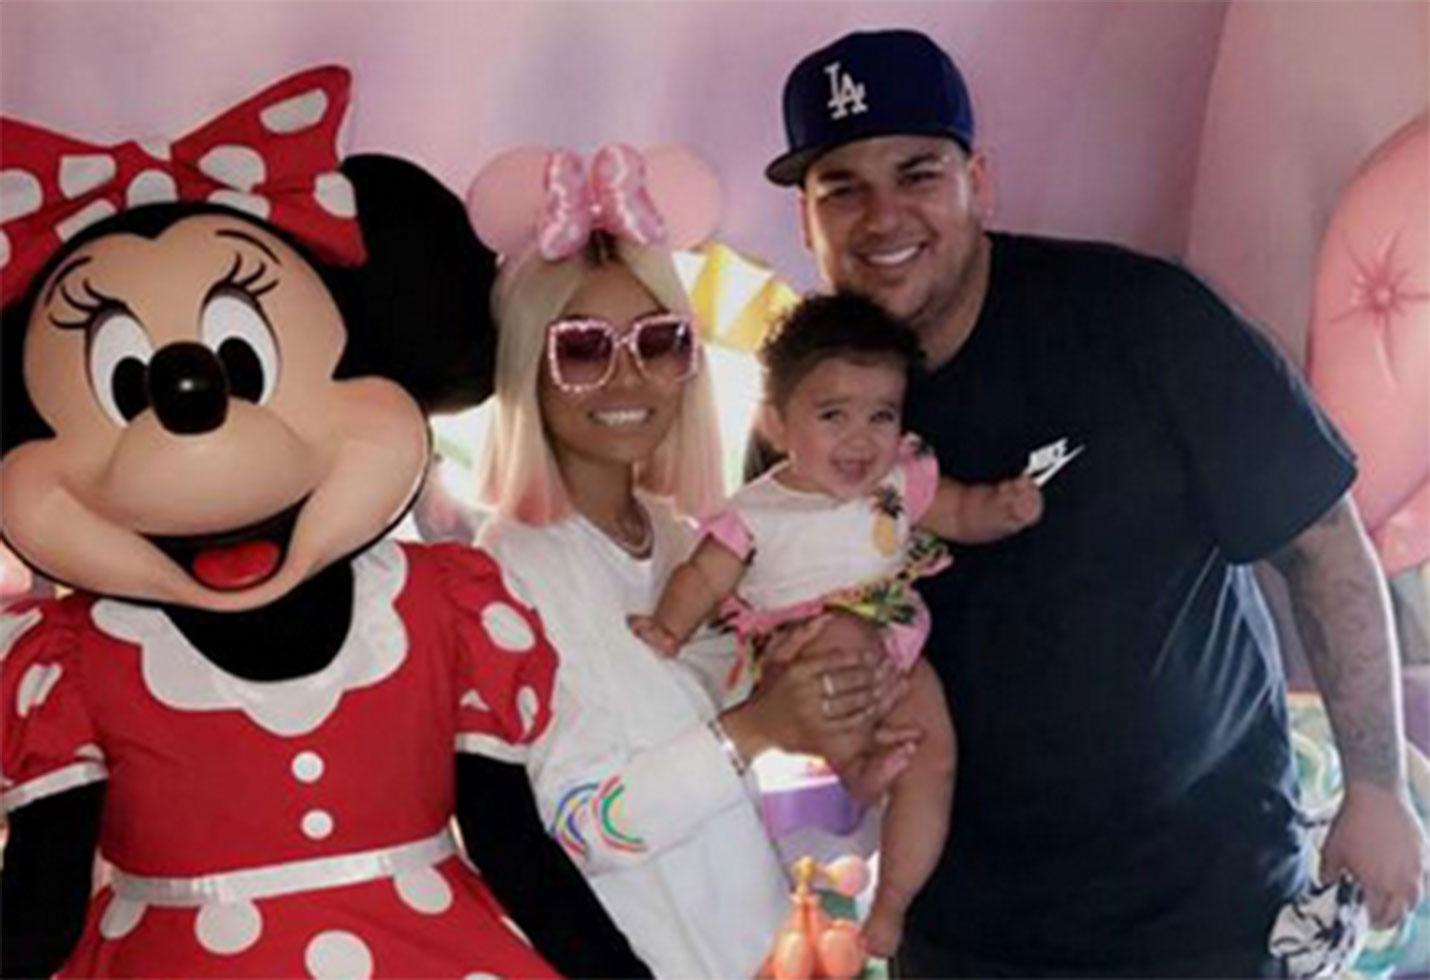 Rob kardashian reunite blac chyna dream fathers day